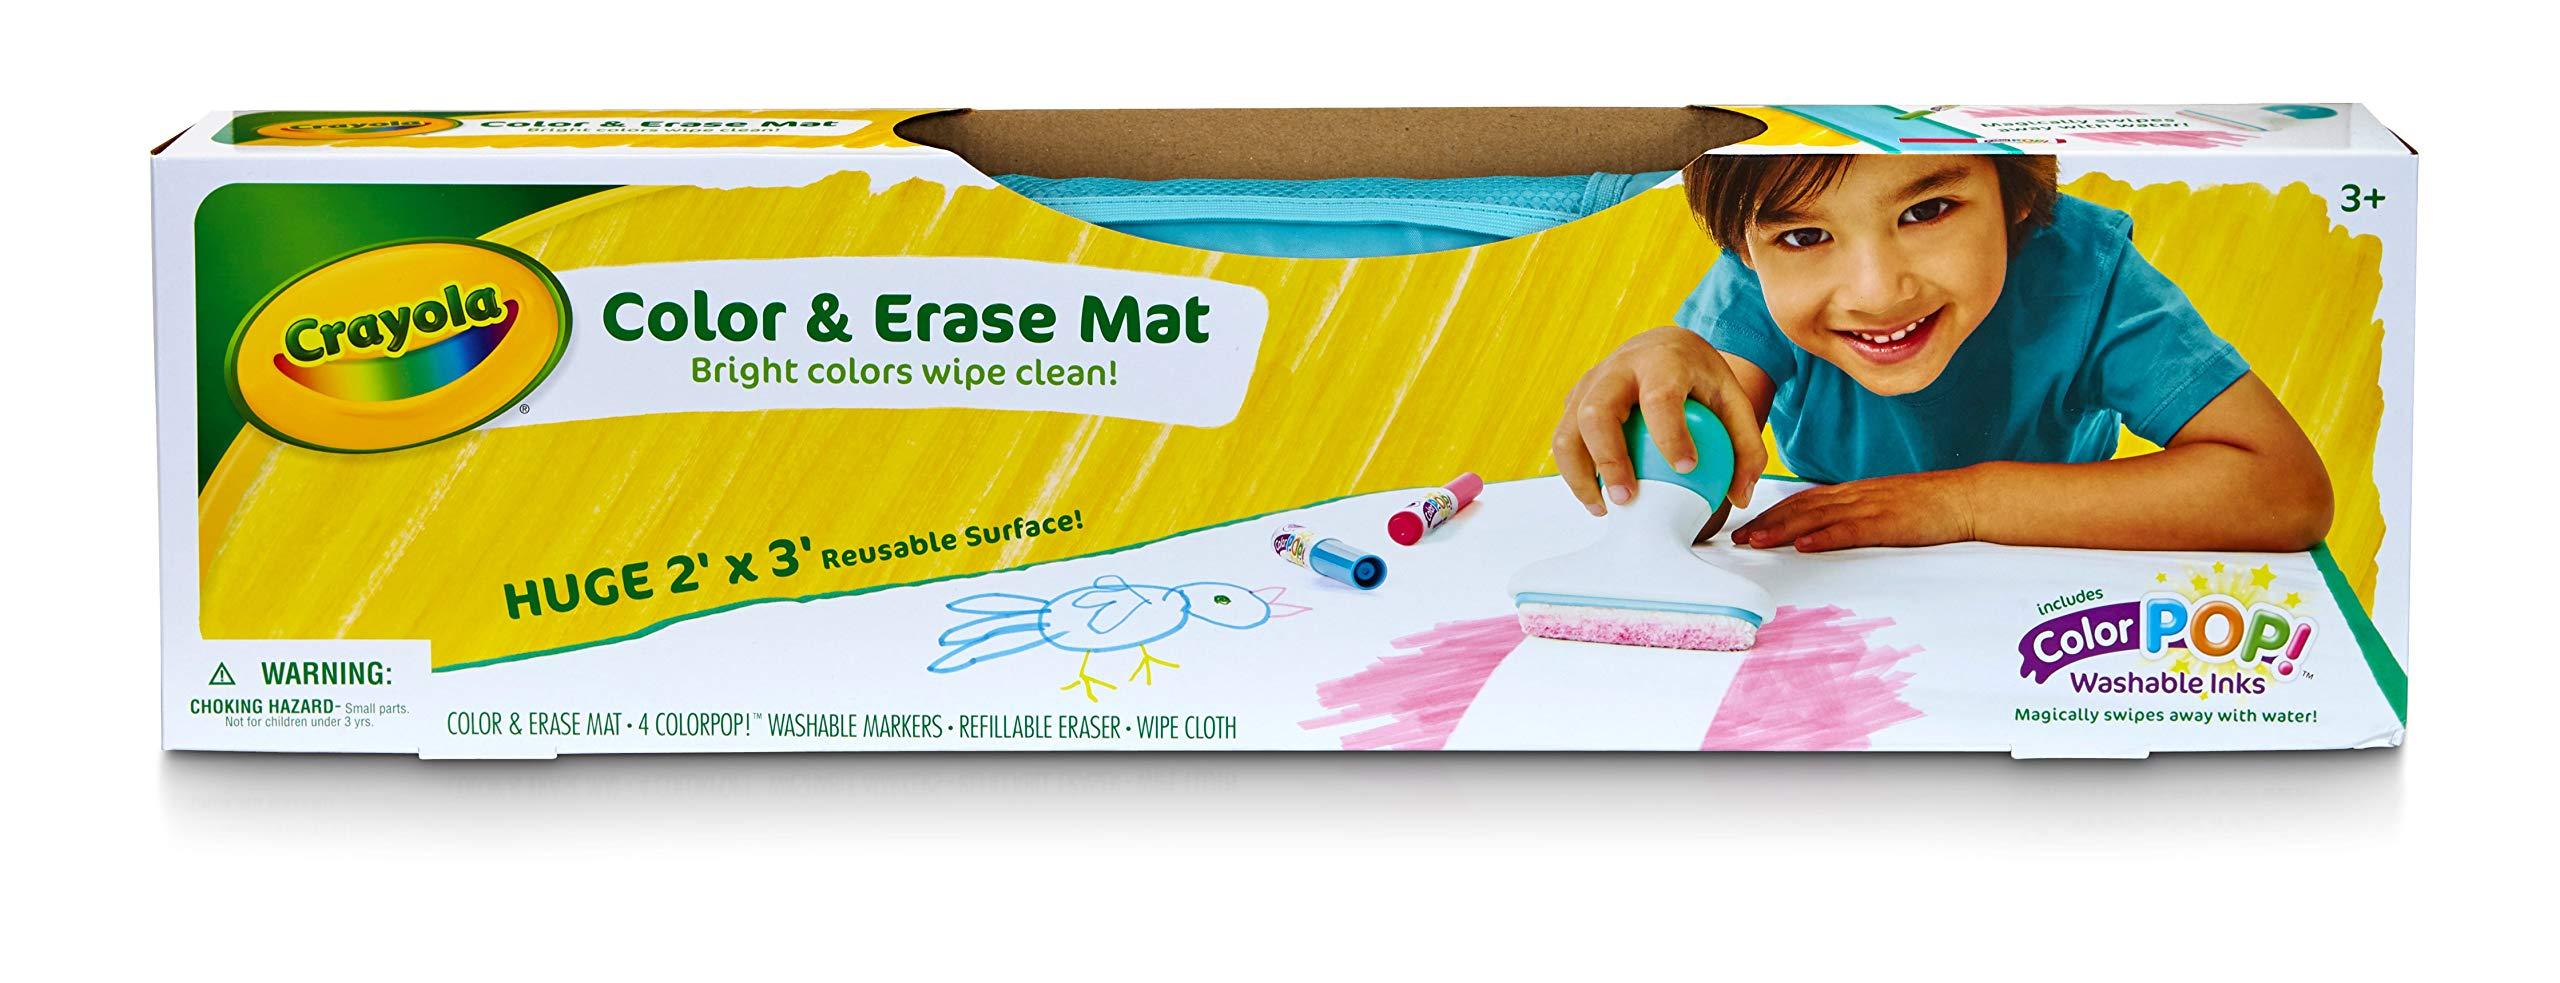 Crayola Color & Erase Mat, Travel Coloring